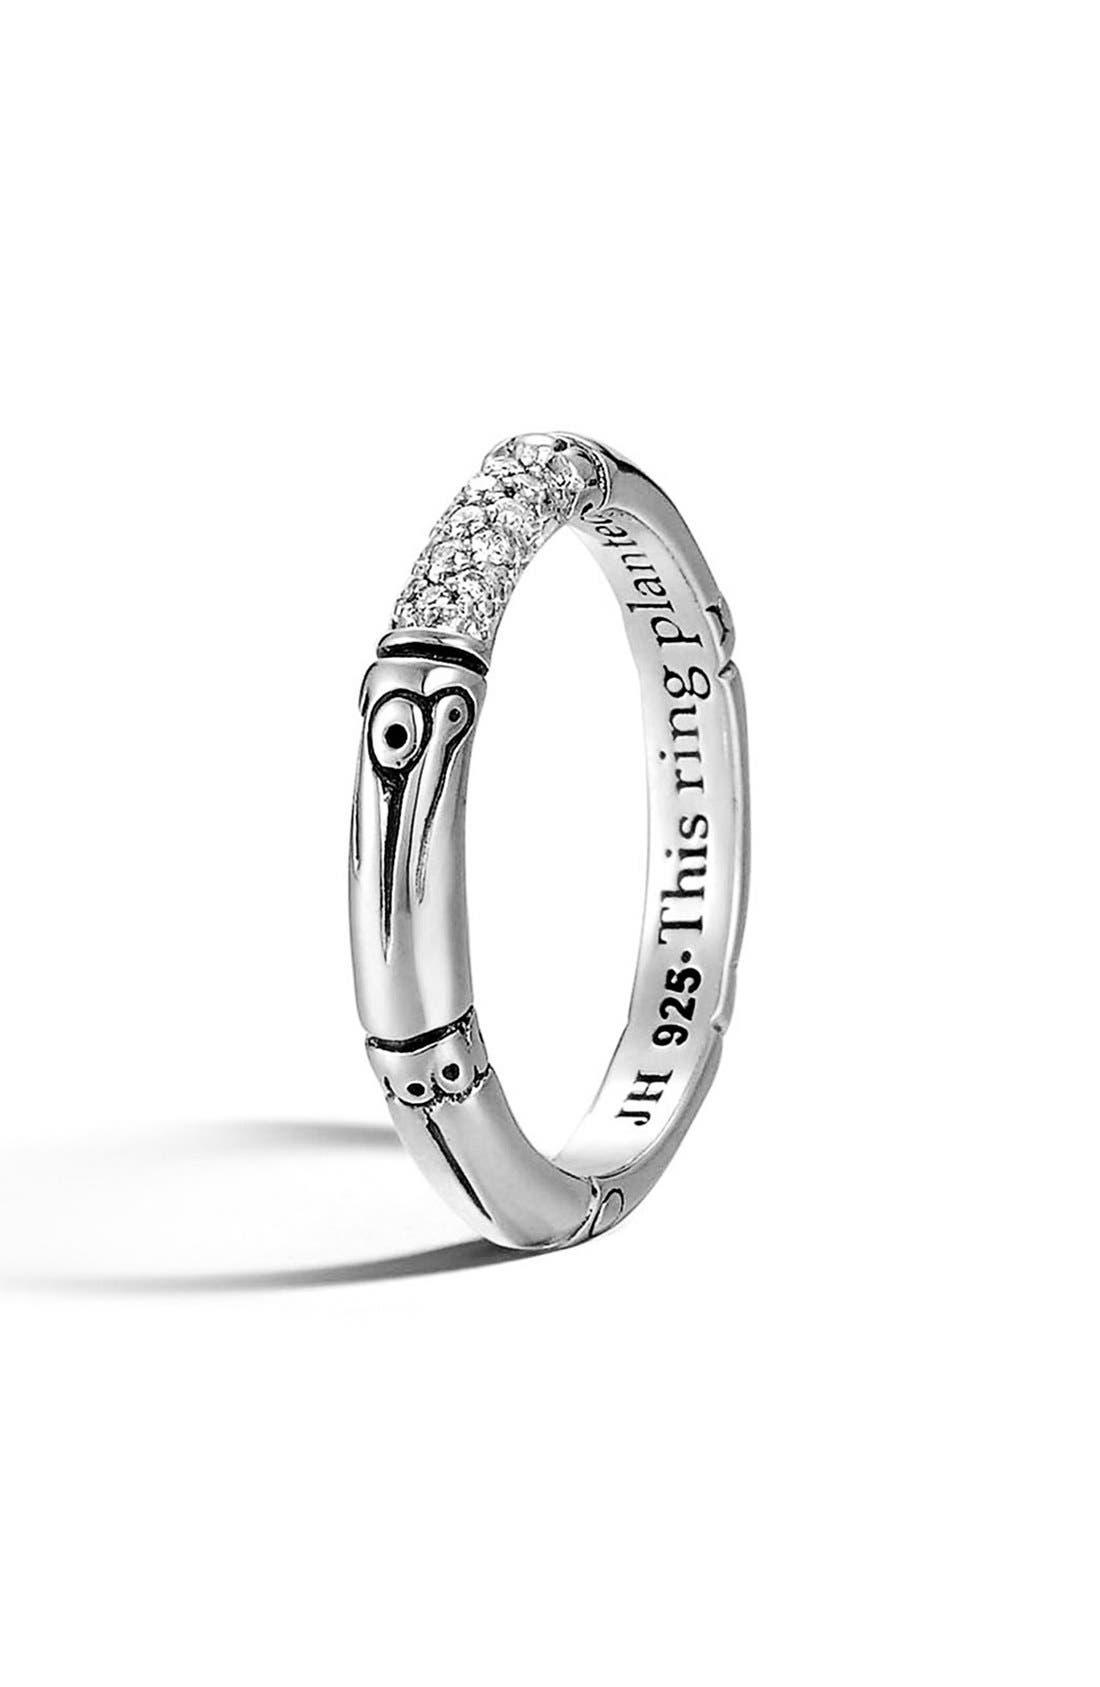 Main Image - John Hardy 'Bamboo' Pavé Diamond Ring